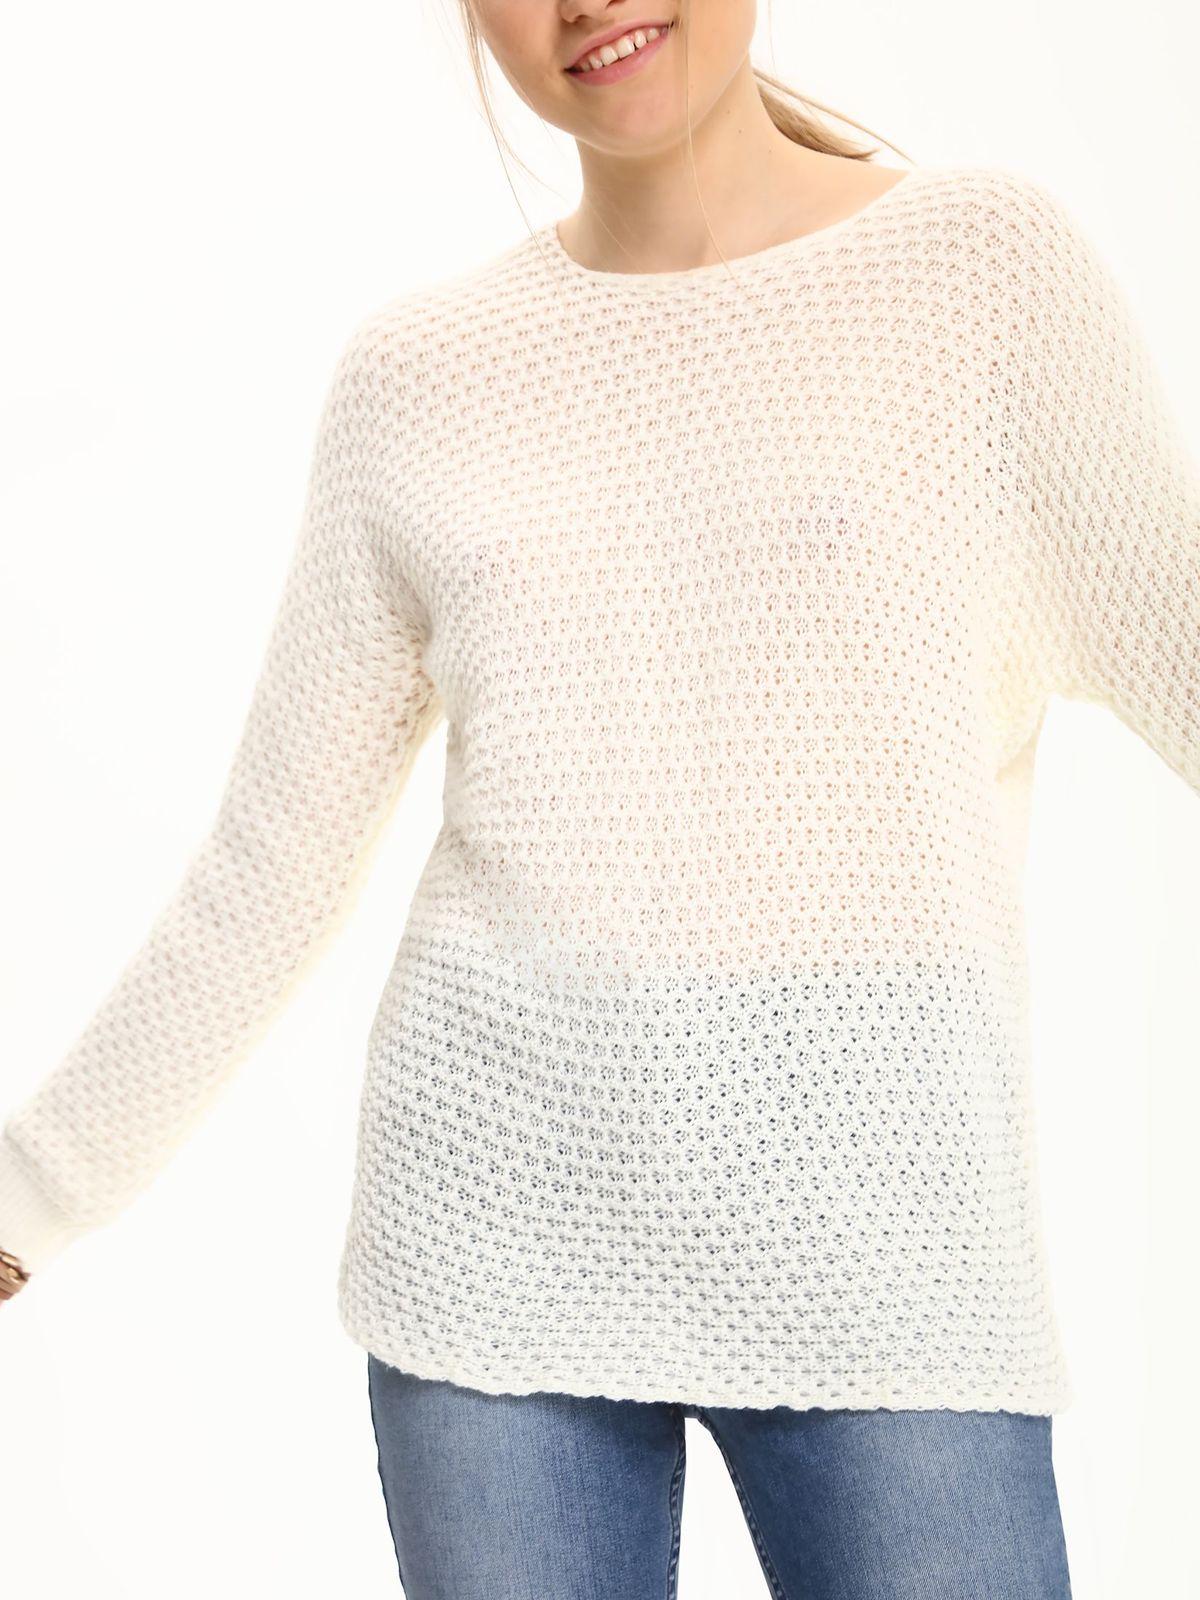 TROLL πλεκτο πουλοβερ one size